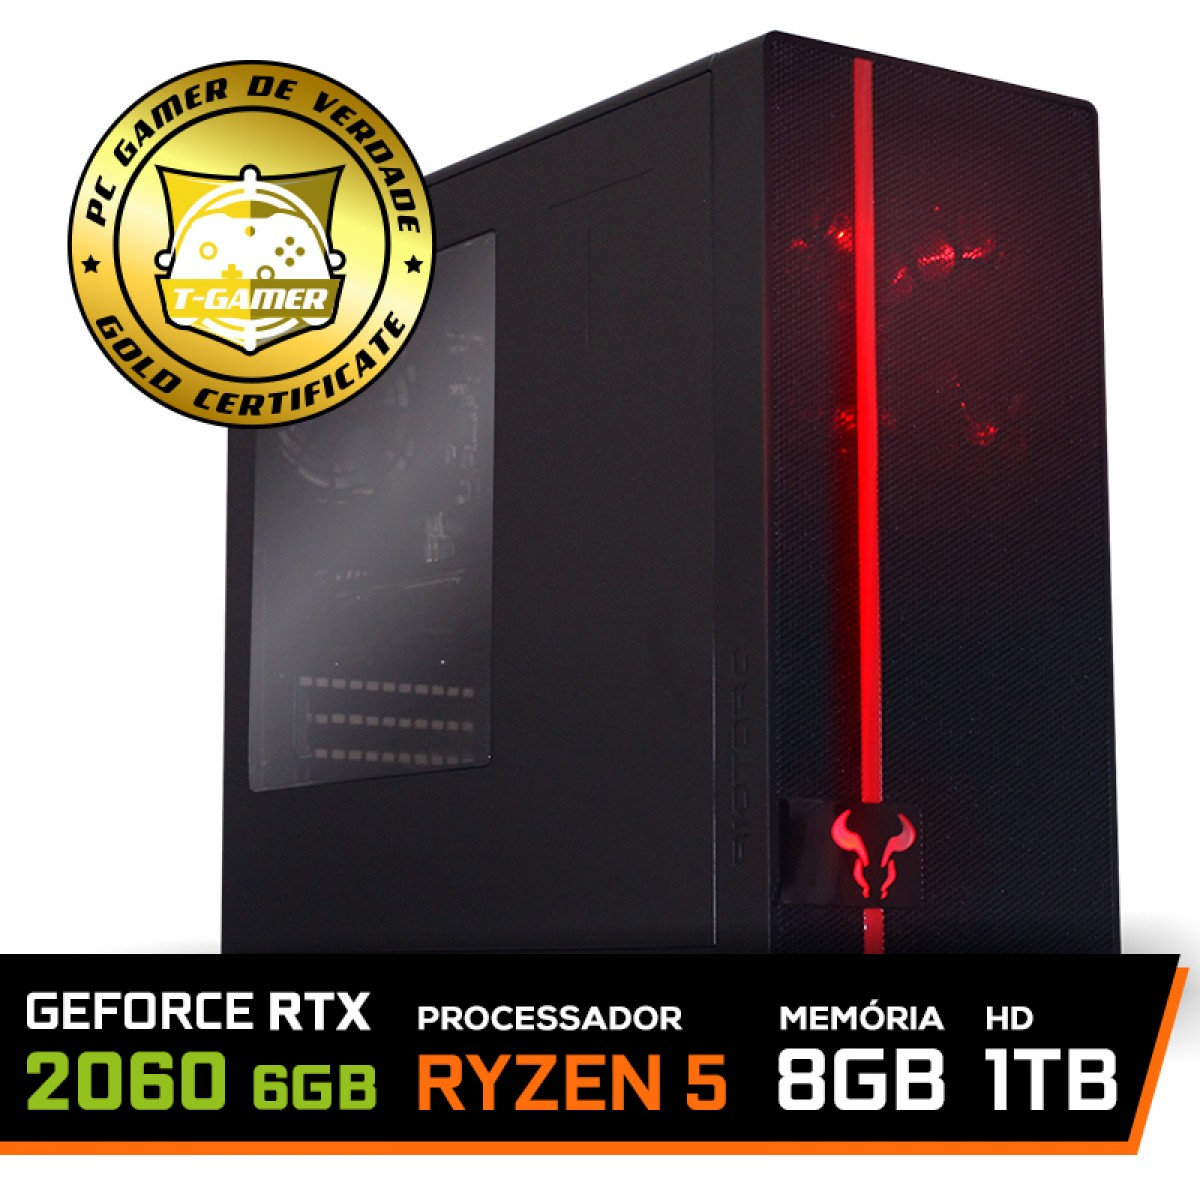 Pc Gamer T-Commander LVL-5 AMD Ryzen 5 2600 / GeForce RTX 2060 6GB / DDR4 8GB / HD 1TB / 600W